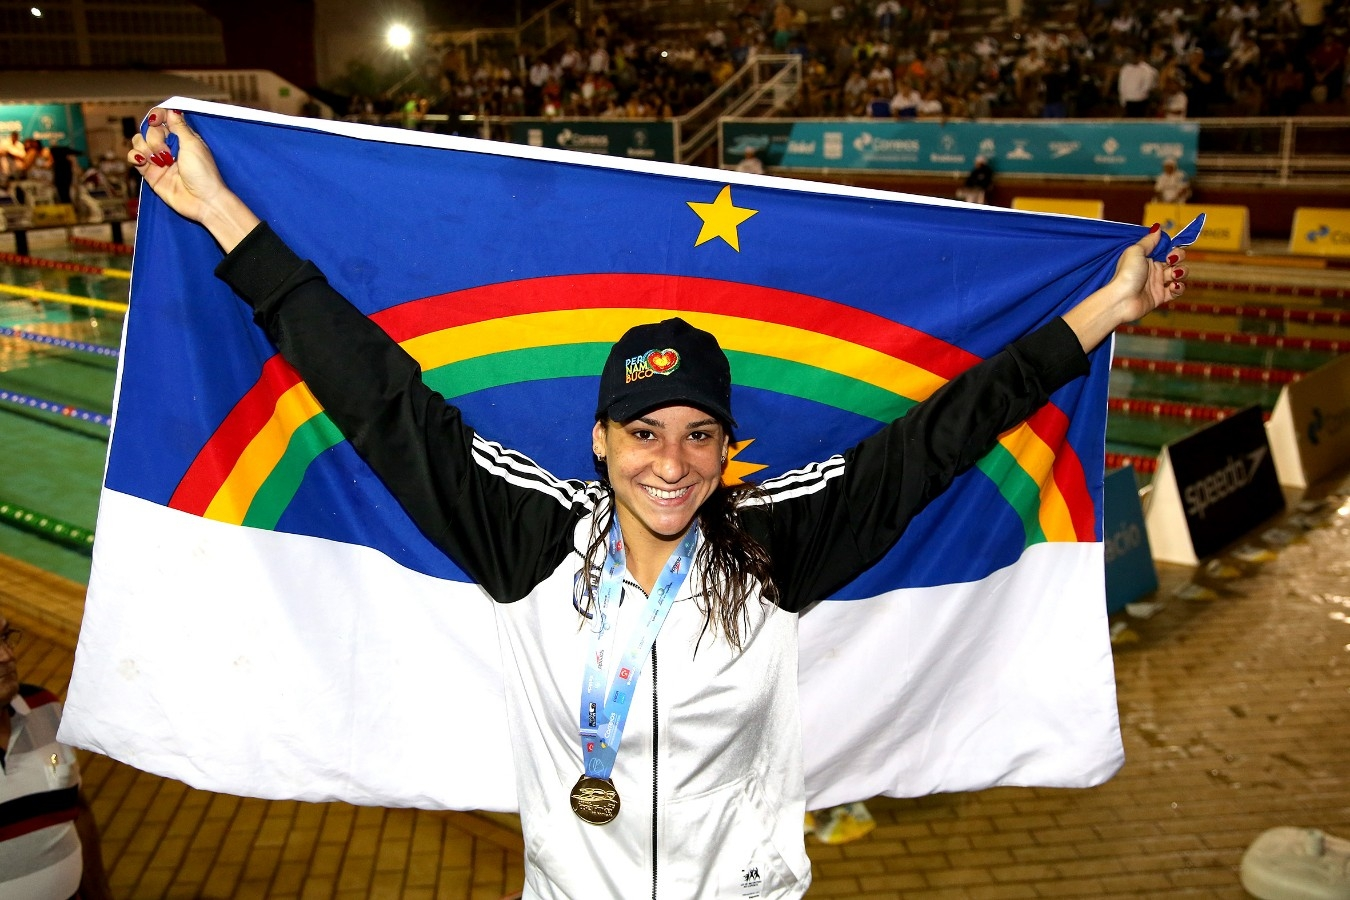 Joanna Maranhao - Trofeu Jose Finkel de Natacao no Clube Internacional de Regatas. 14 de Setembro de 2016, Santos, SP, Brasil. Foto:Satiro Sodré/SSPress.